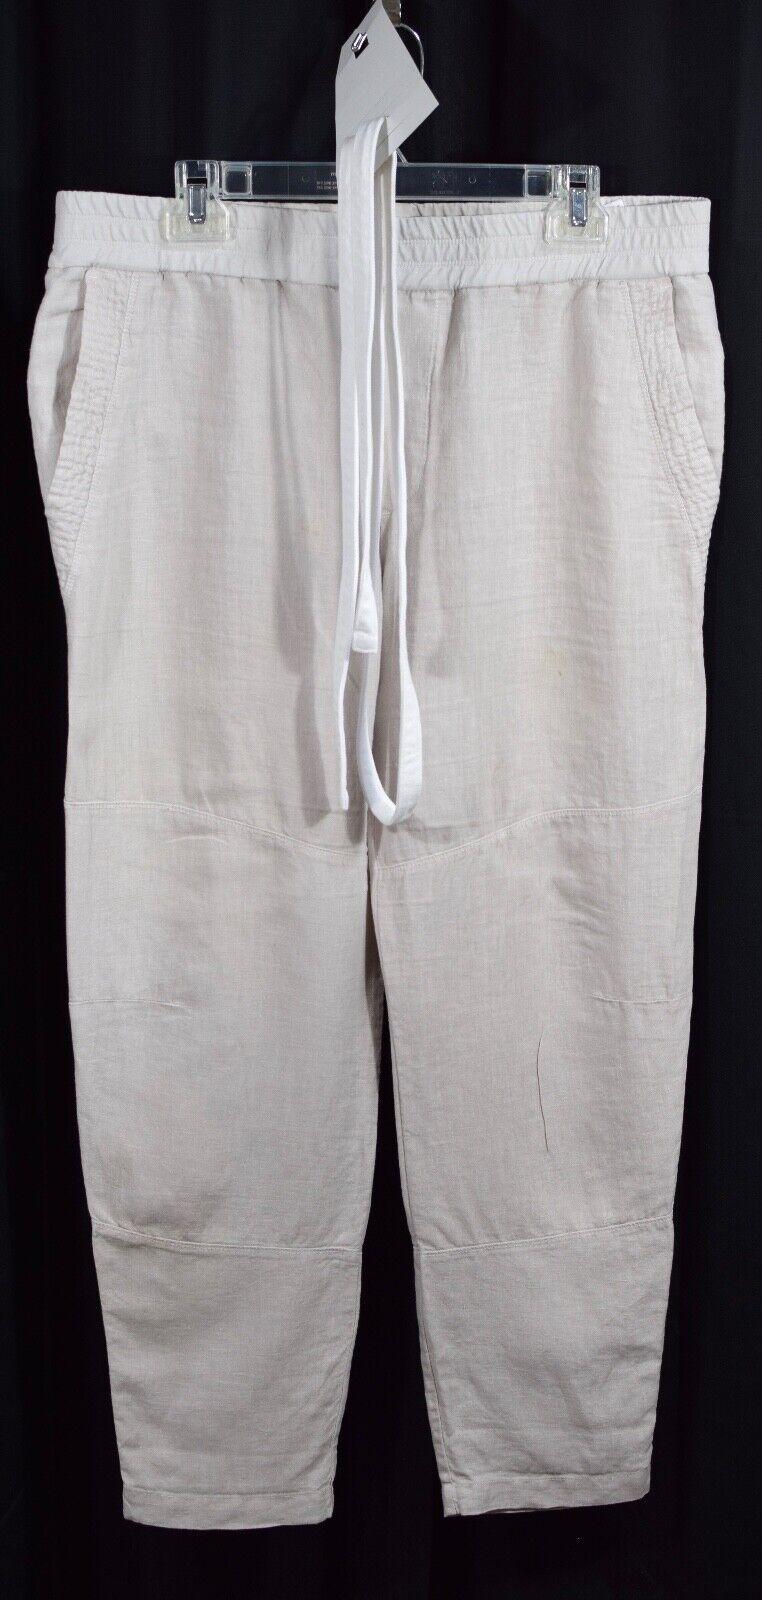 James Perse Canvas Linen Patched Pant Calcite Size 4